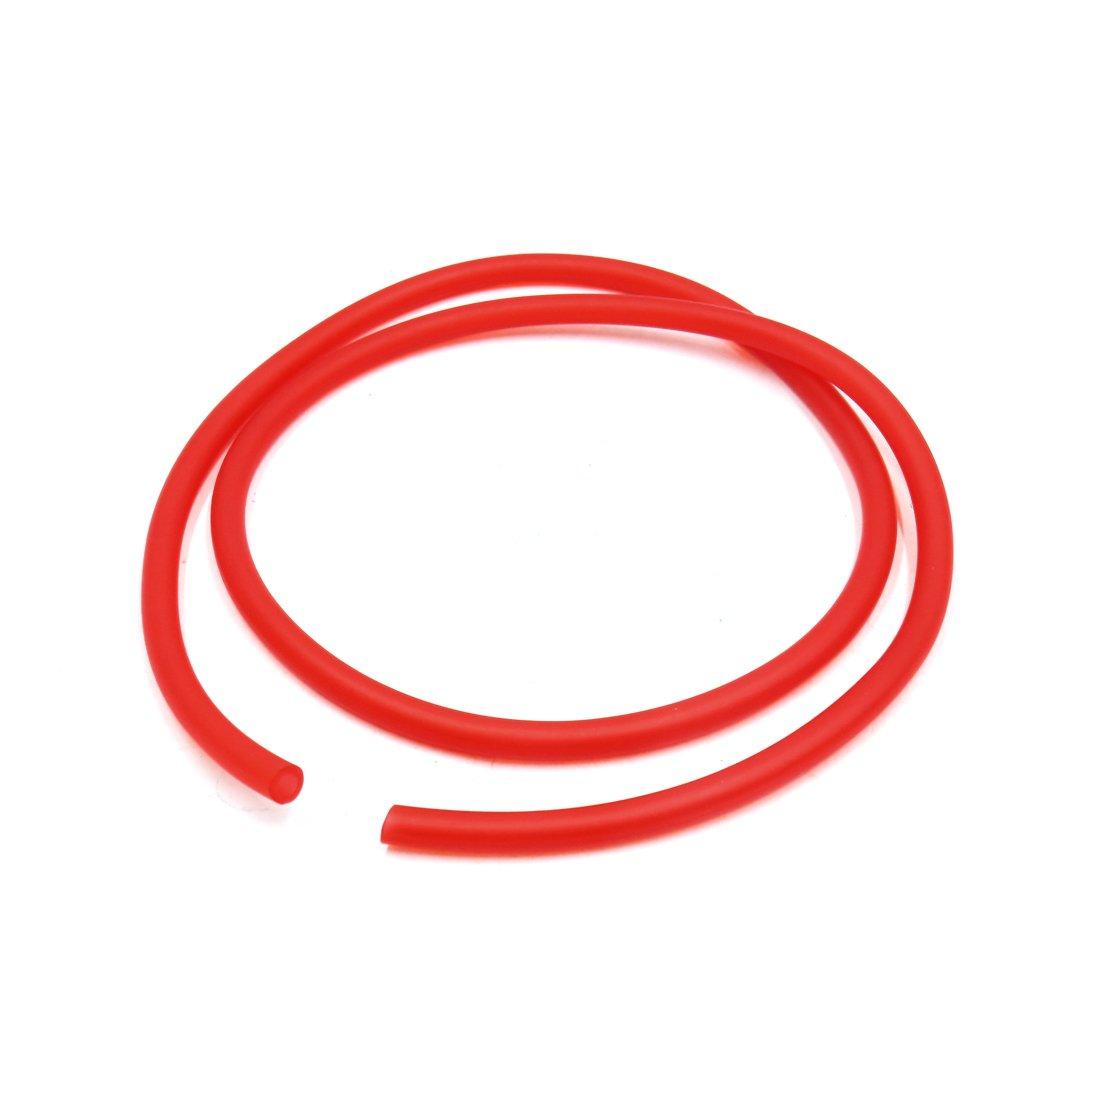 Sourcingmap 4Uds Manguera de Silicona Tubo de Gasolina Rojo para Moto 4,5mmx 8mm